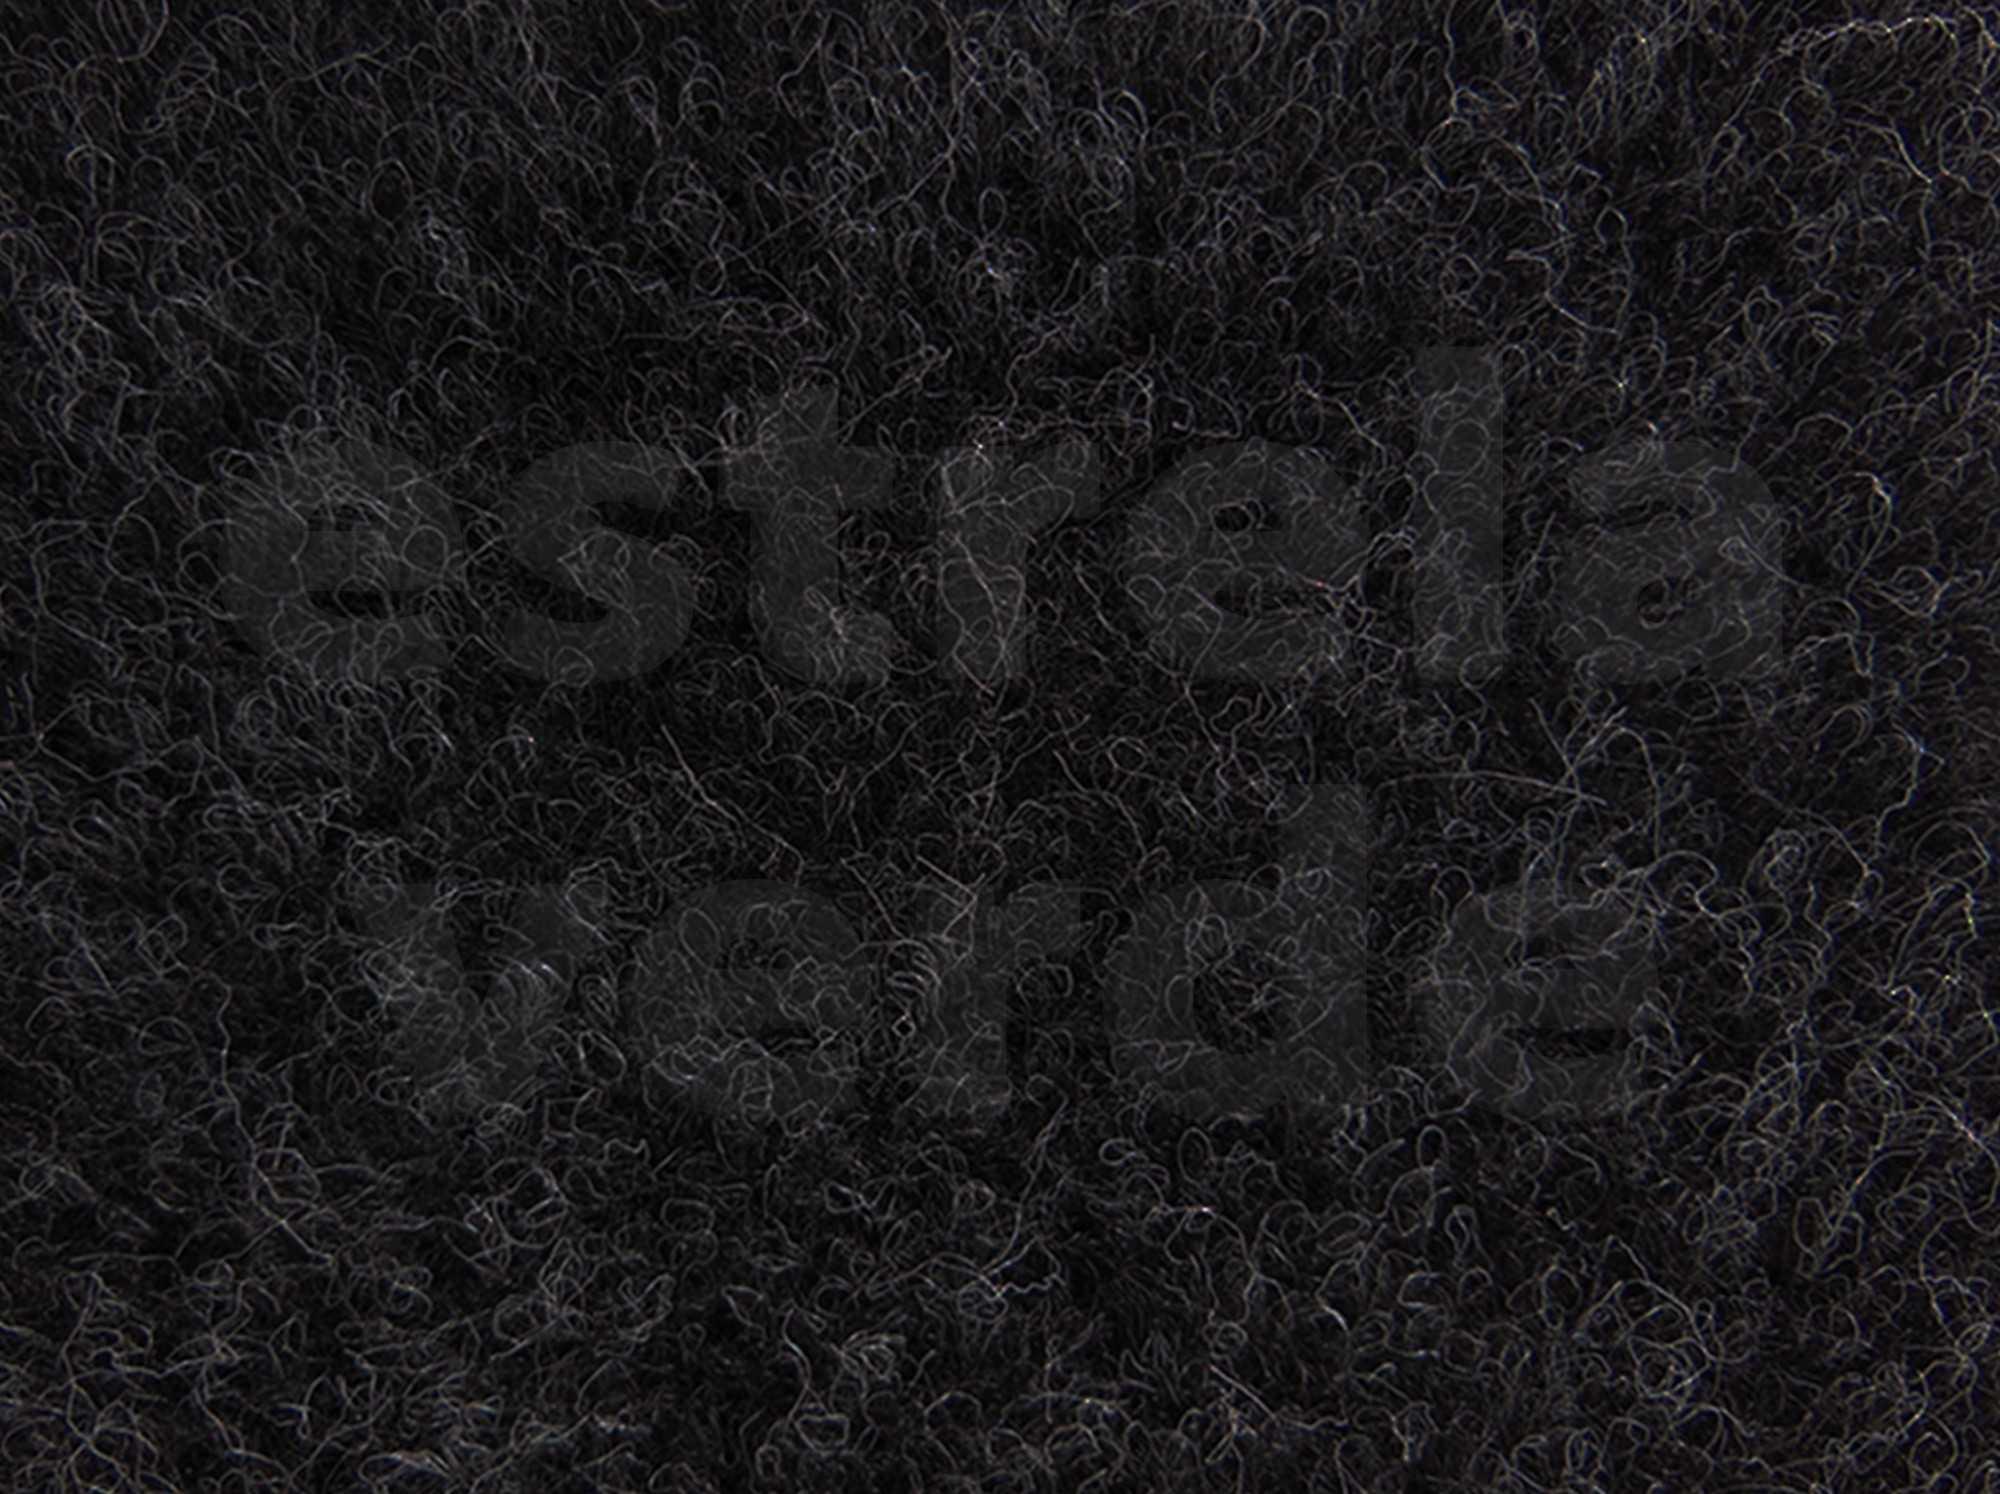 CARPETE GRAFITE ESC MESCLA C/ RESINA (917)2,00LARG  - Estrela Verde